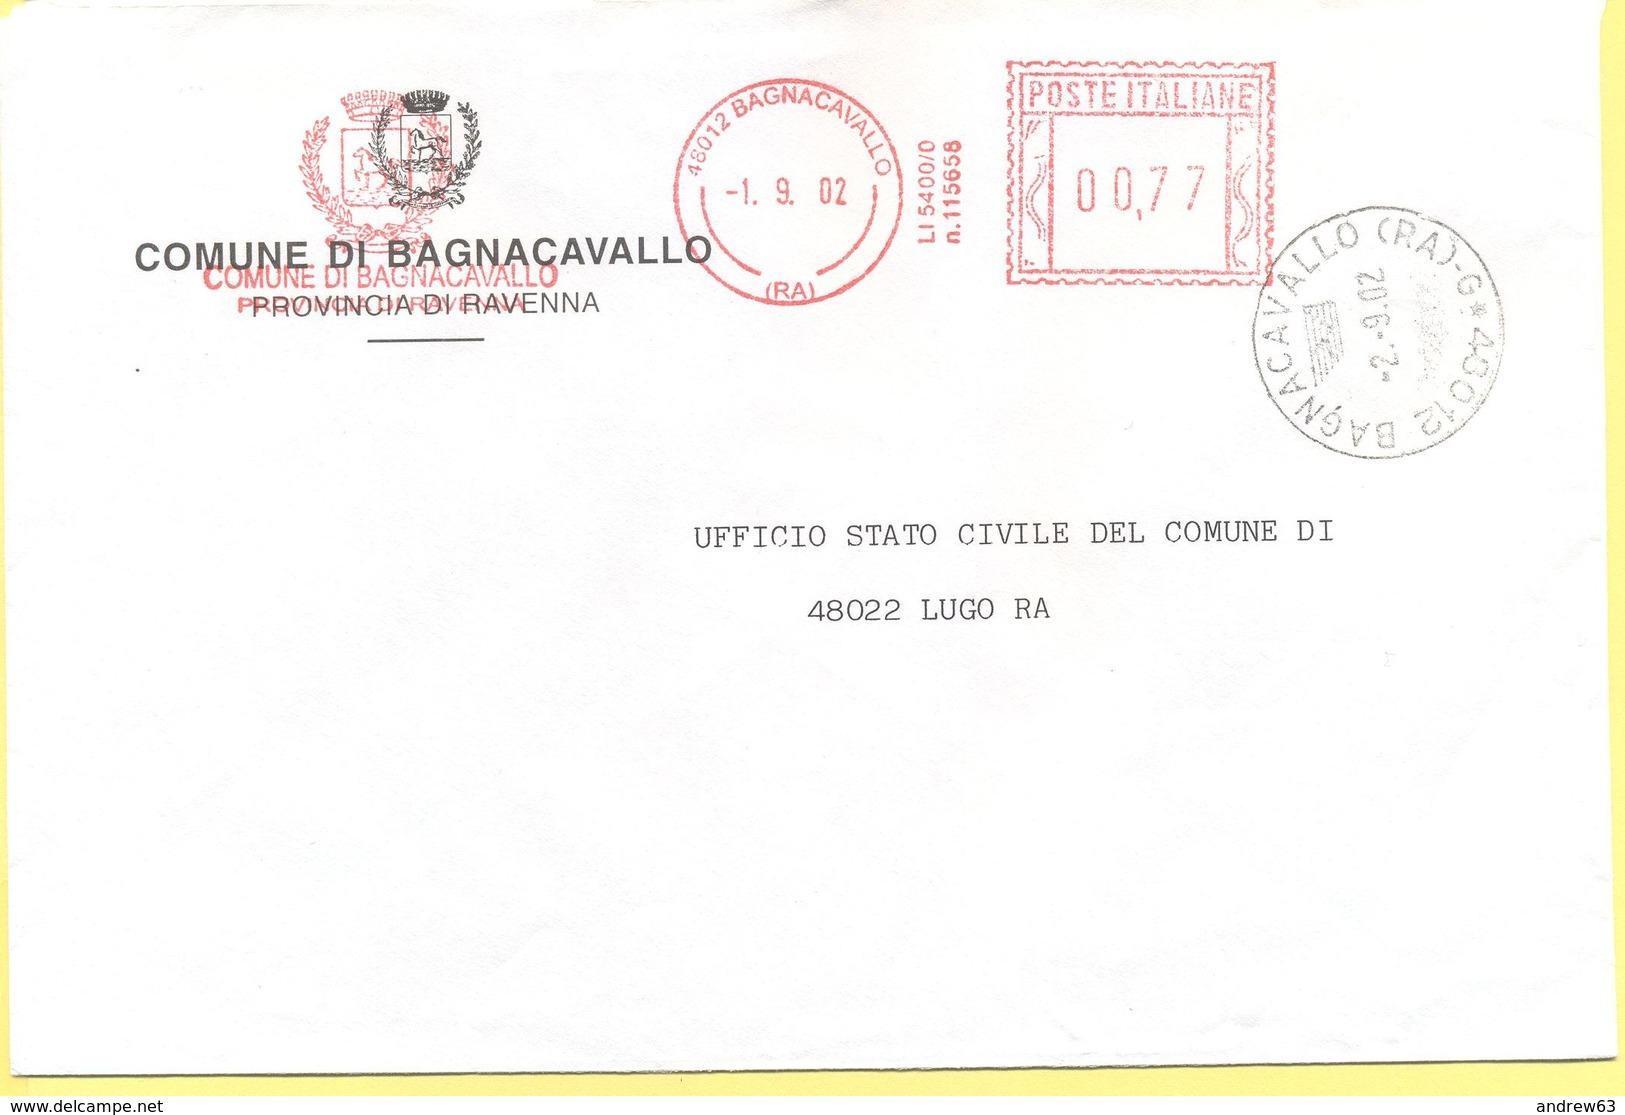 ITALIA - ITALY - ITALIE - 2002 - 0,77 EMA, Red Cancel - Comune Di Bagnacavallo - Viaggiata Da Bagnacavallo Per Lugo - Affrancature Meccaniche Rosse (EMA)